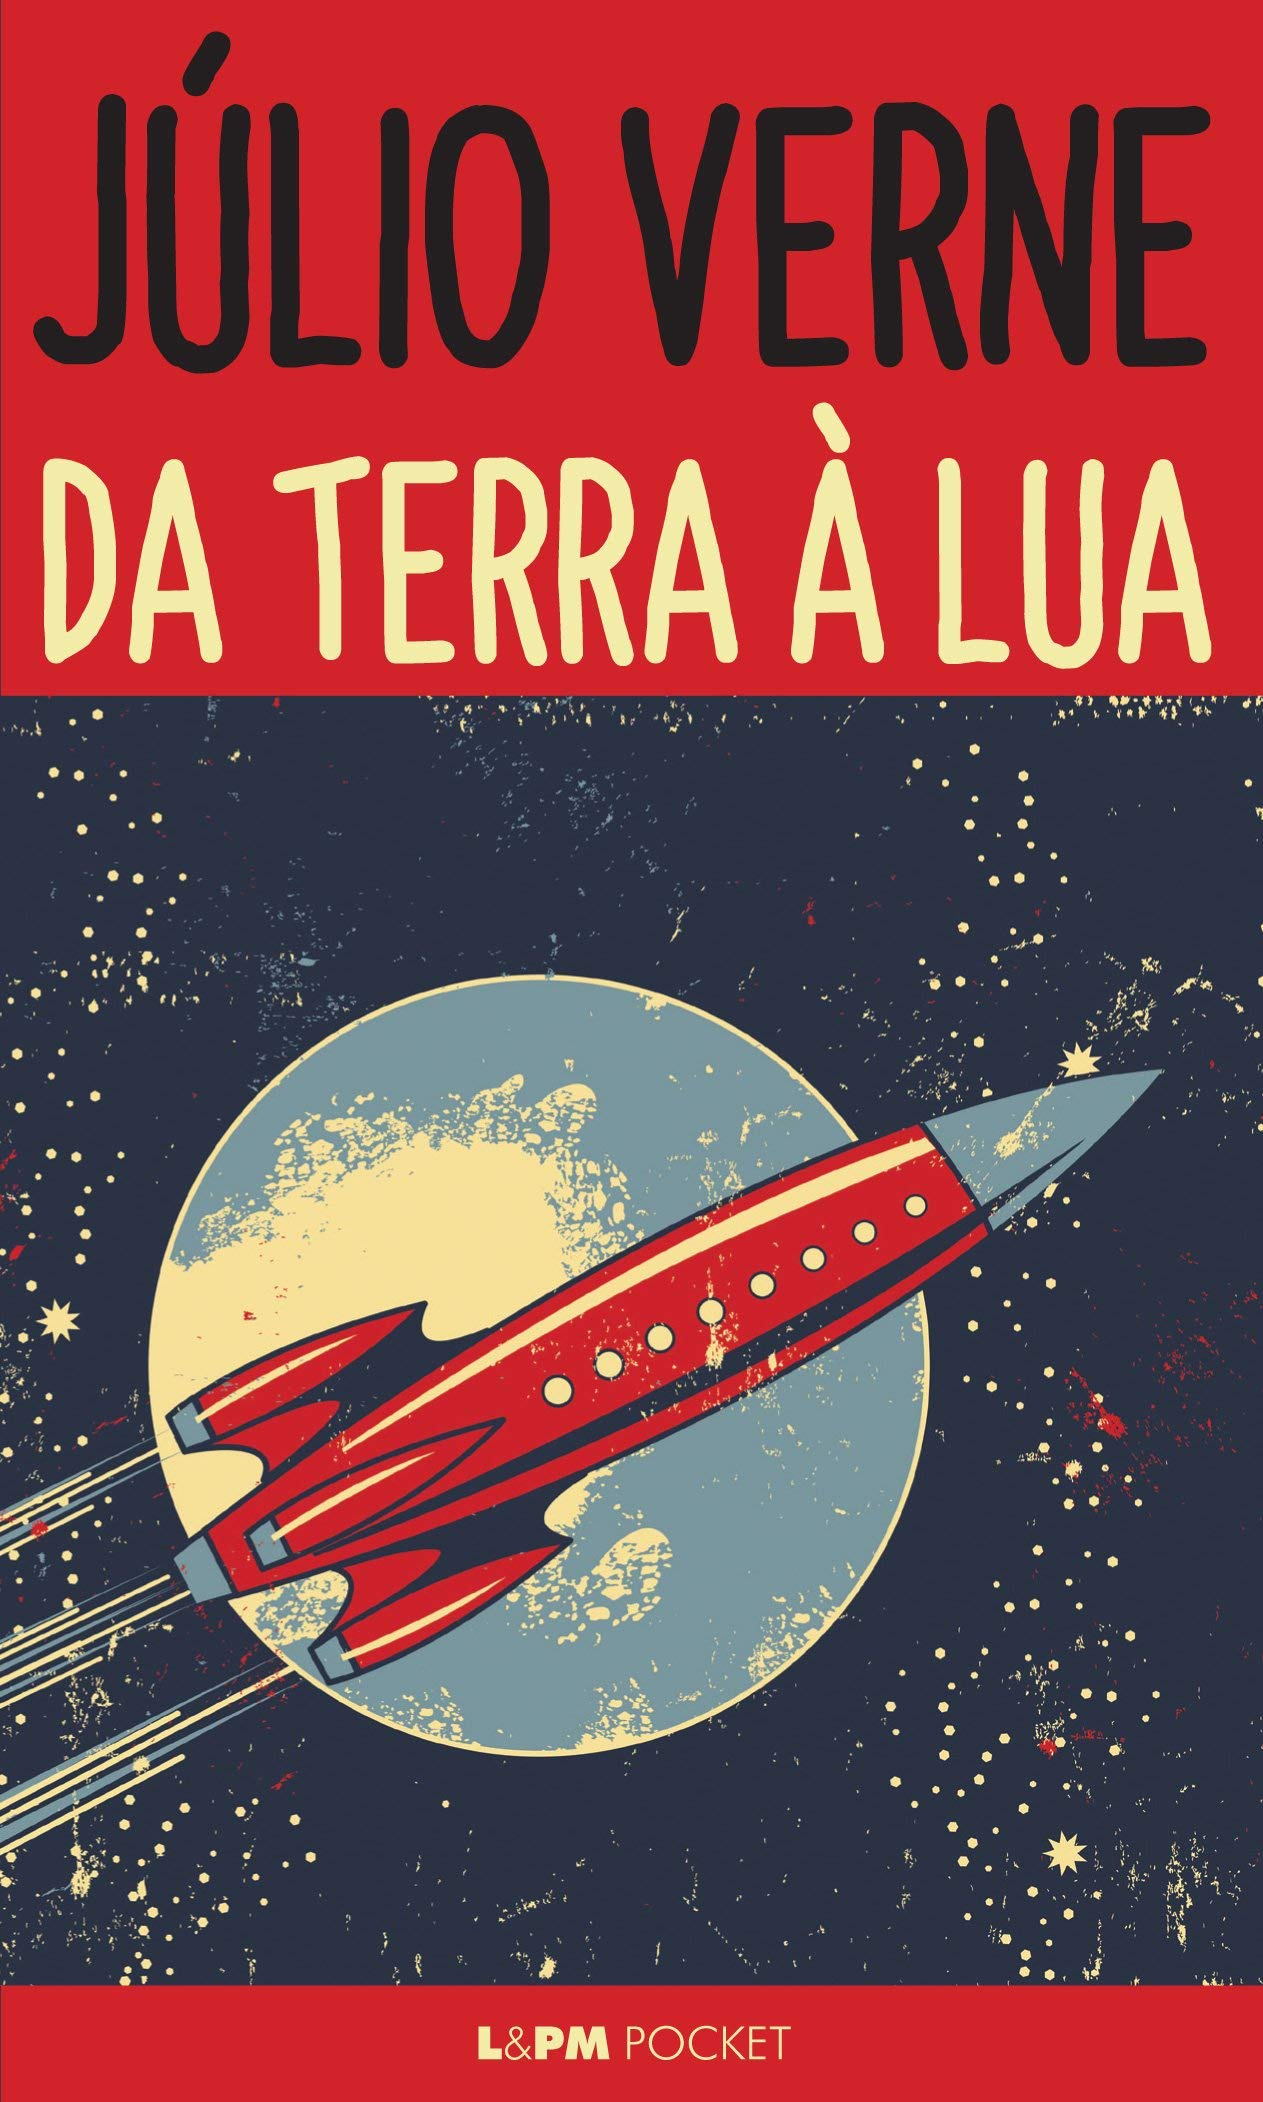 Da Terra à Lua, de Júlio Verne